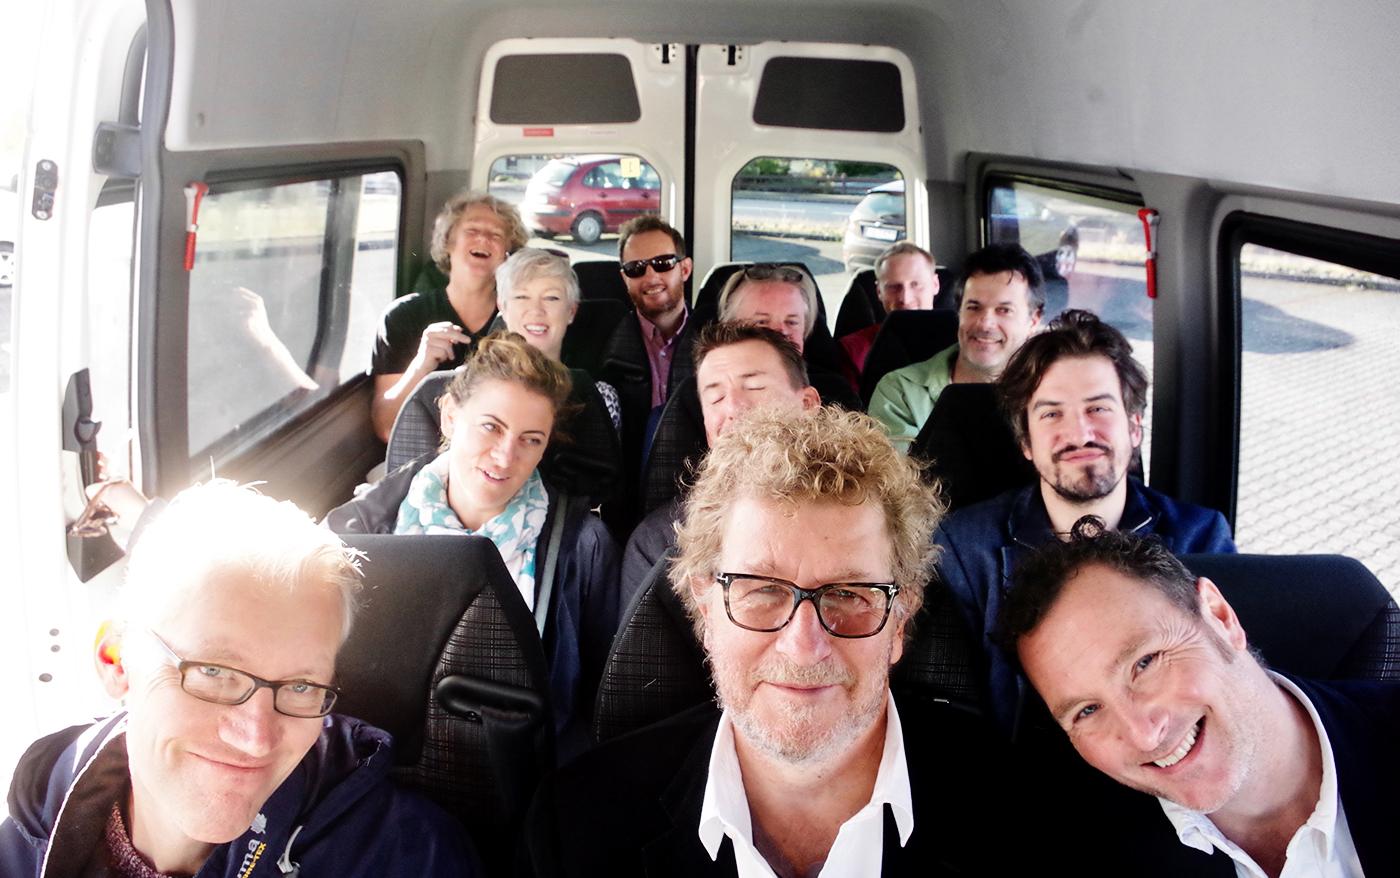 The Authors XI in Iceland: (From the back, left) John Sutton, Nicholas Hogg, Tom Eadon, Sadie Holland, Matt Thacker, Steve Cannane, Laura